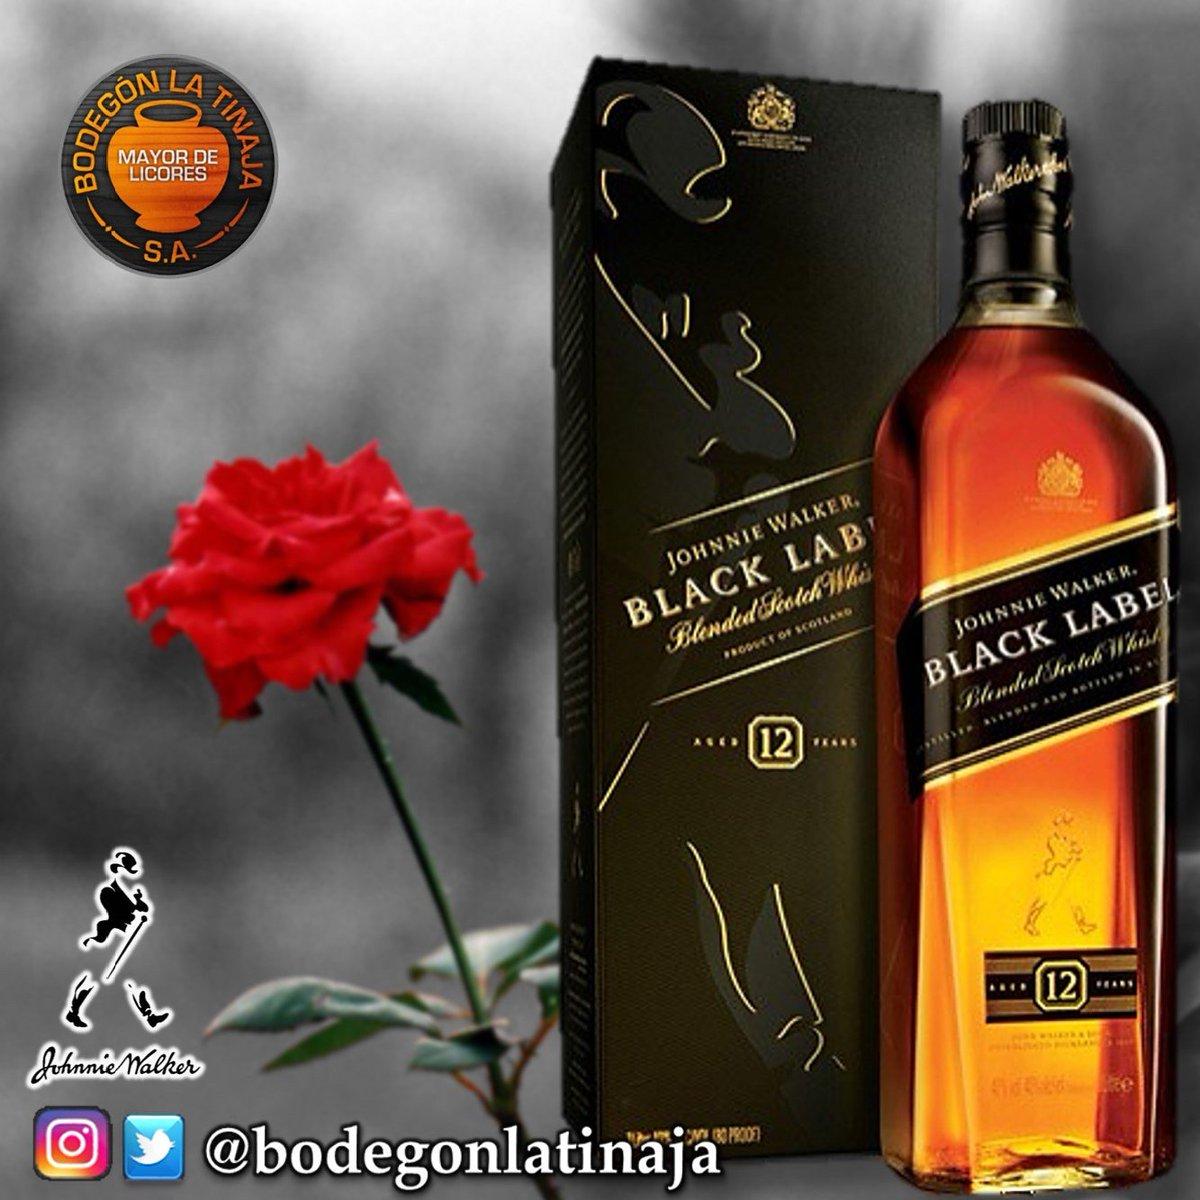 #BlendedScotchWhisky #JhonnyWalker #BlackLabel #EtiquetaNegra Disponible en #BodegonLaTinaja en la 72. #Visitanos<br>http://pic.twitter.com/rjGpA6r8OQ